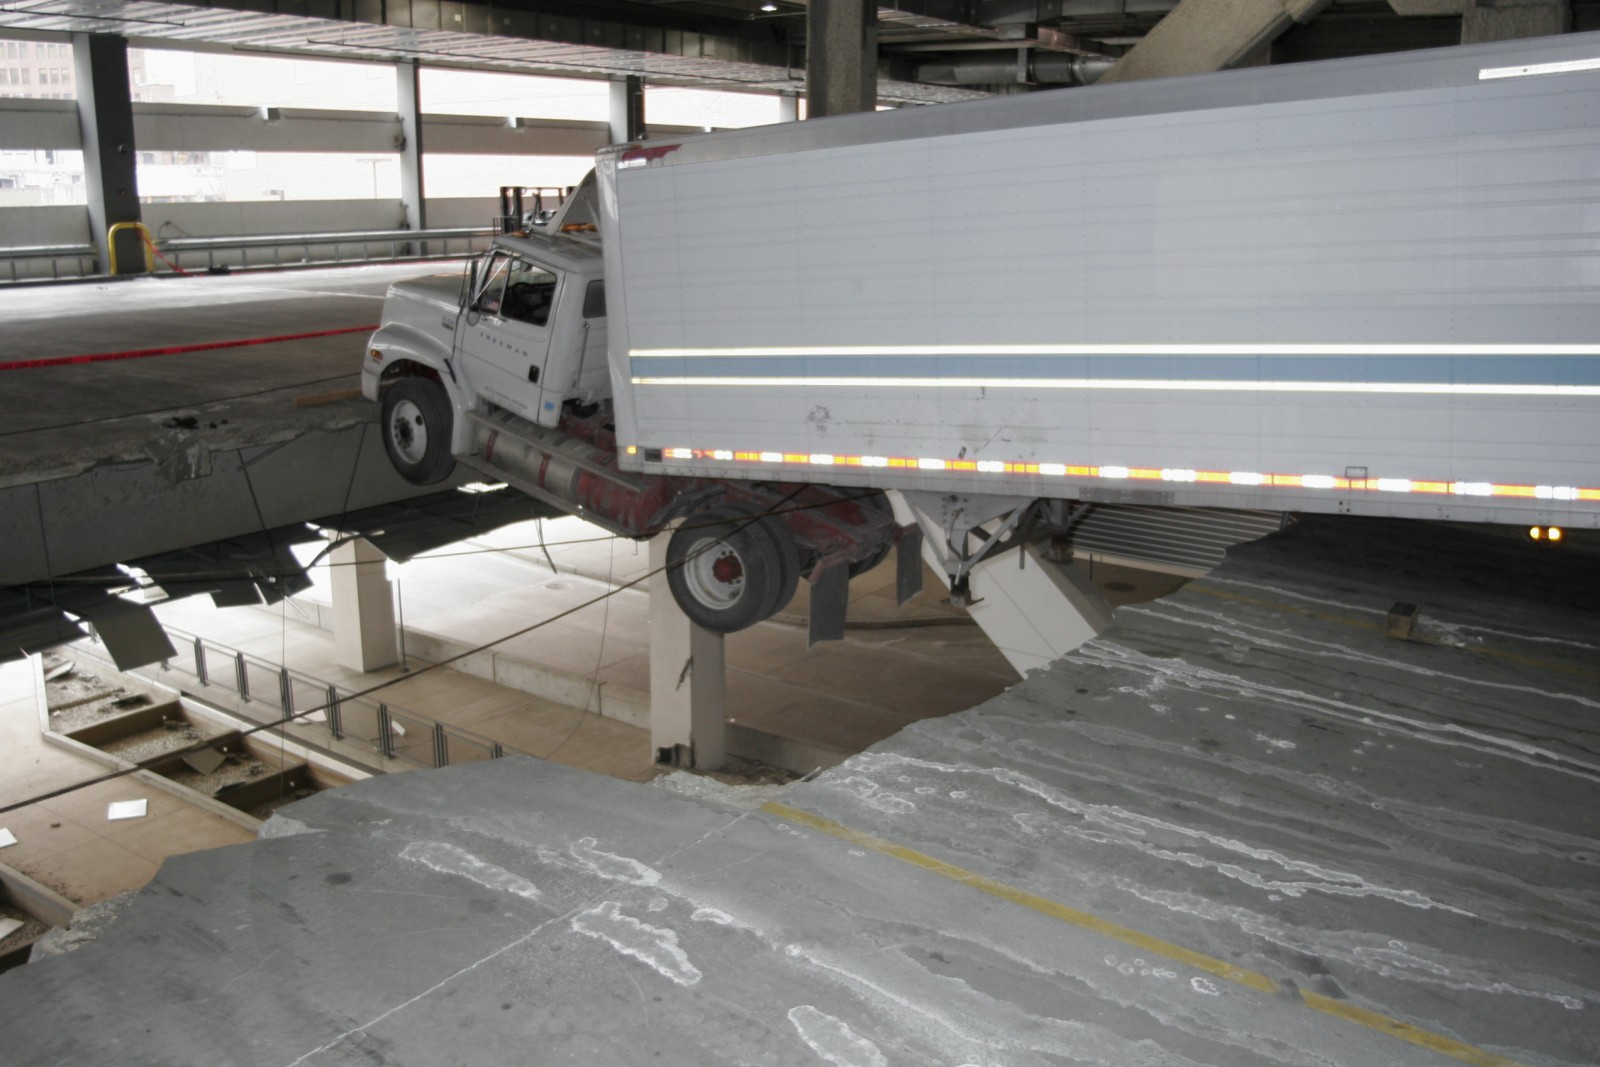 Minneapolis Convention Center Floor Plan: Minneapolis Convention Center Loading Dock